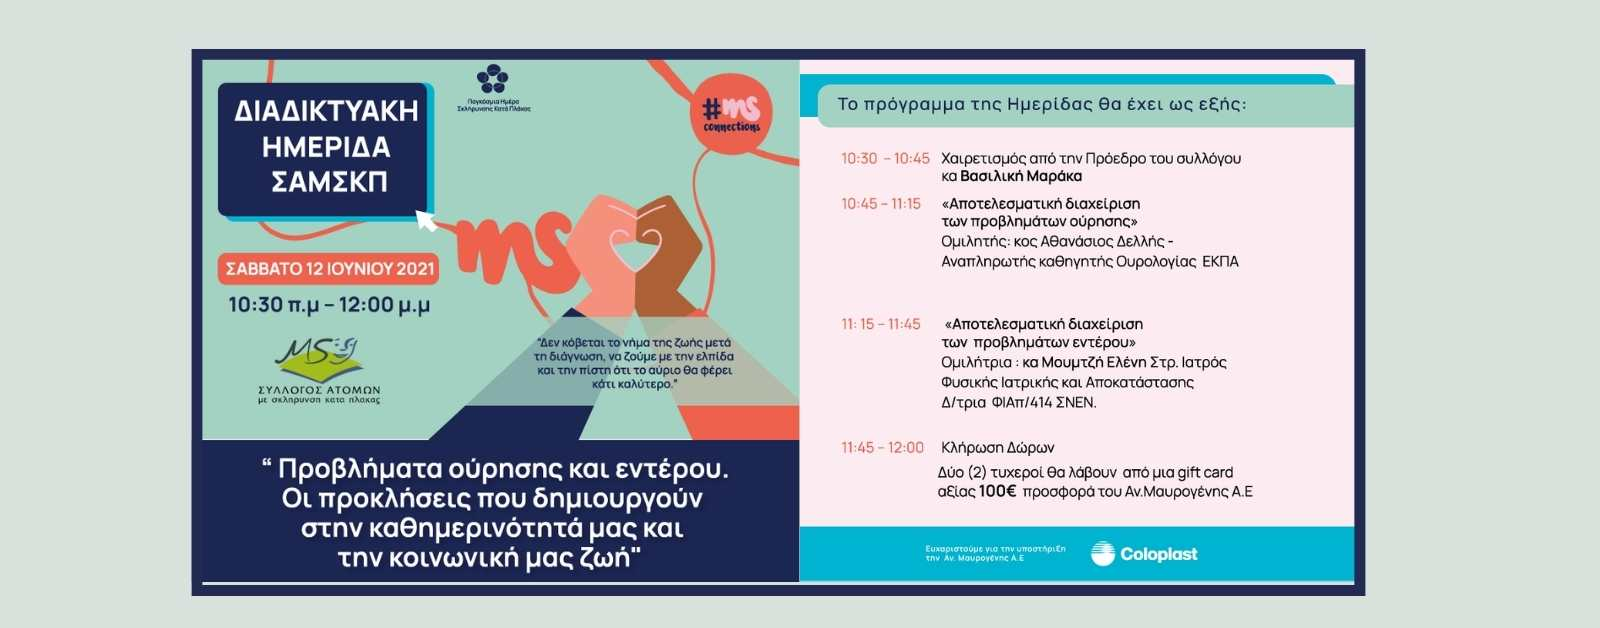 Webinar ΣΑΜΣΚΠ 12/06: Προβλήματα ούρησης και εντέρου – Προκλήσεις στην καθημερινότητα & την κοινωνική ζωή